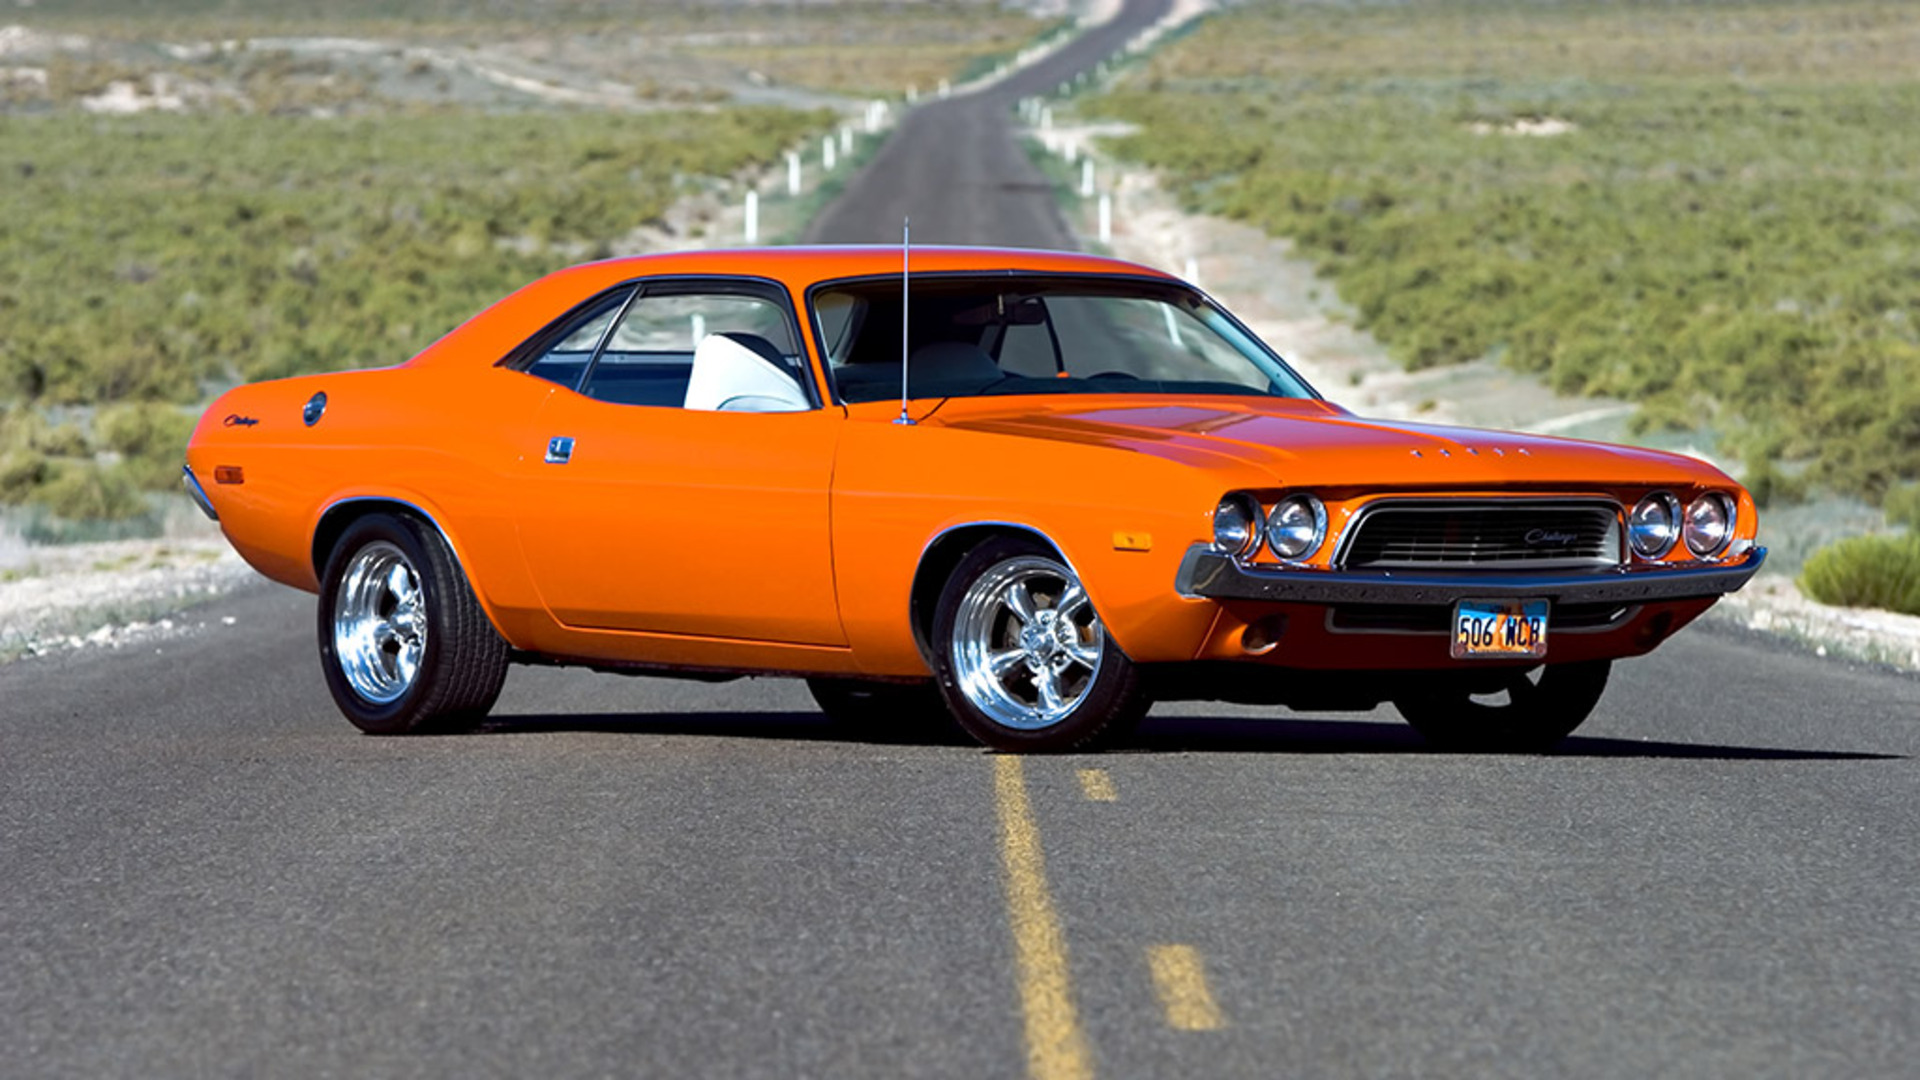 Muscle Car Classic Wallpaper HD 1920x1080 836 1920x1080